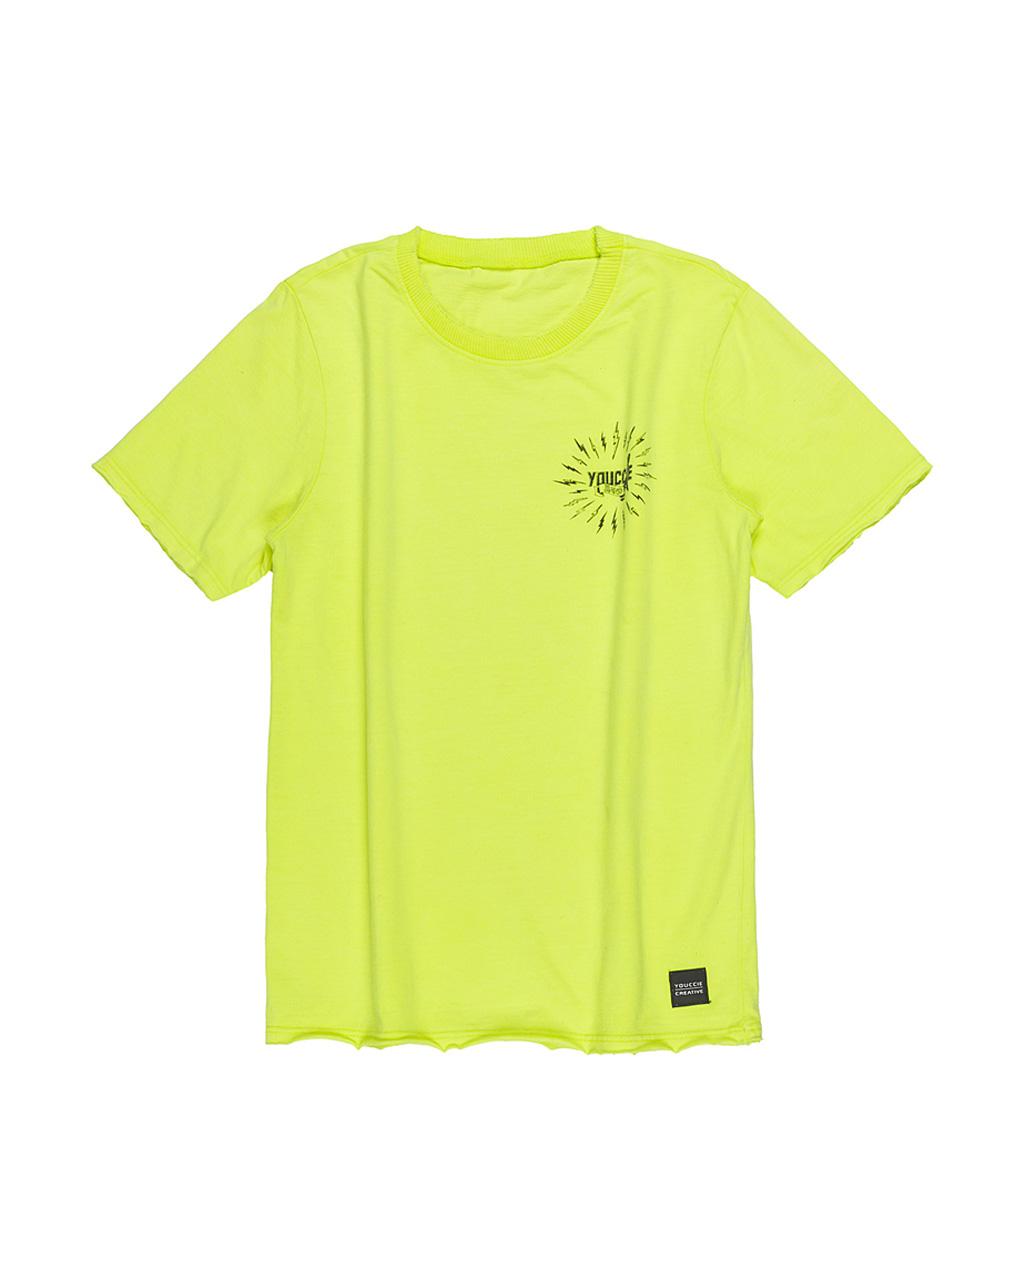 T-Shirt Infantil com Lavação Amarelo Neon Youccie